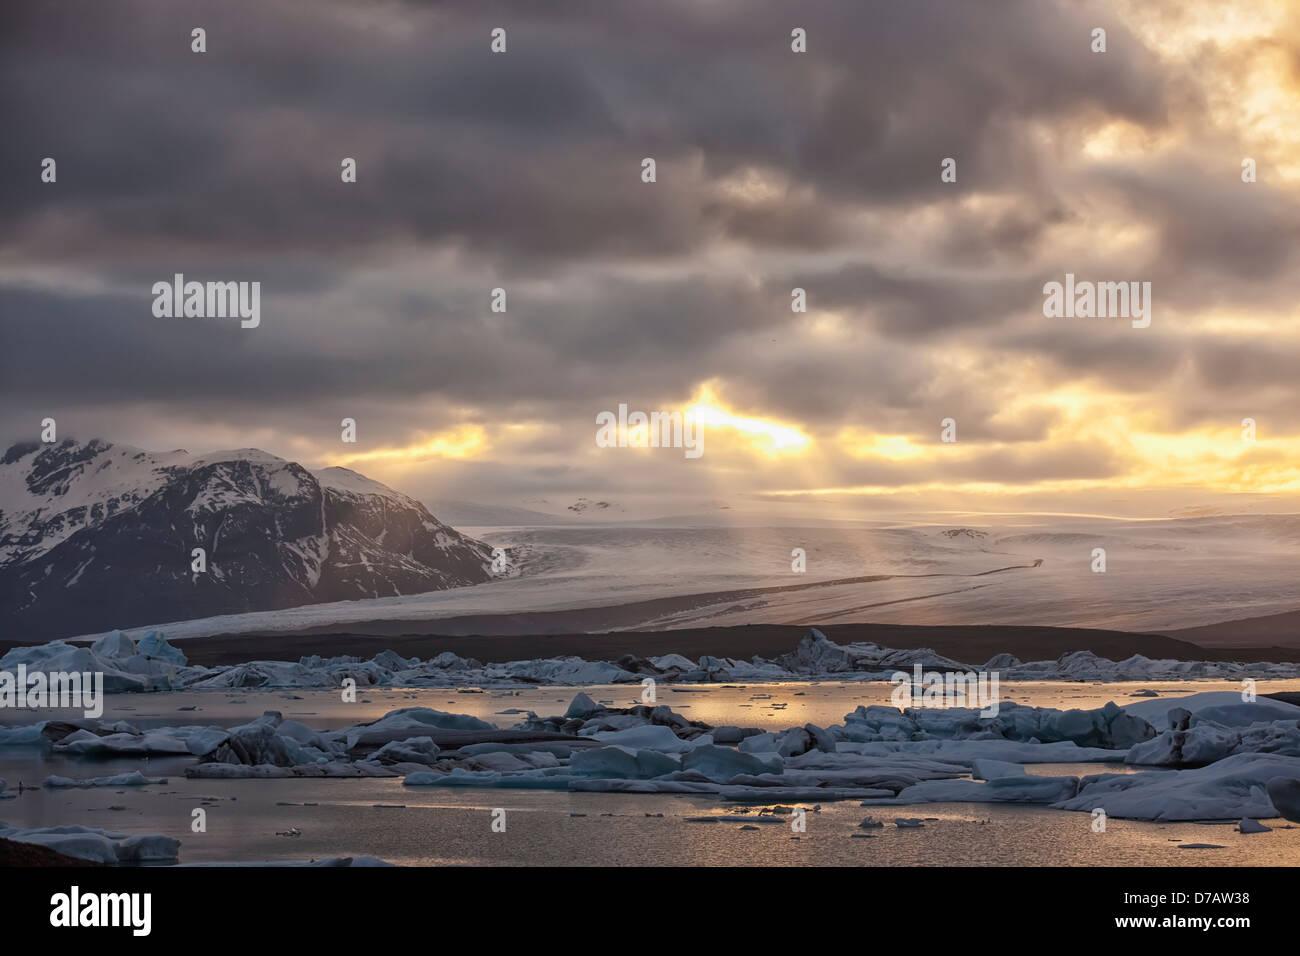 Shafts of sunlight shine on the ice calves floating in glacial lagoon jokulsarlon at the base of breioamerkurjokull; - Stock Image